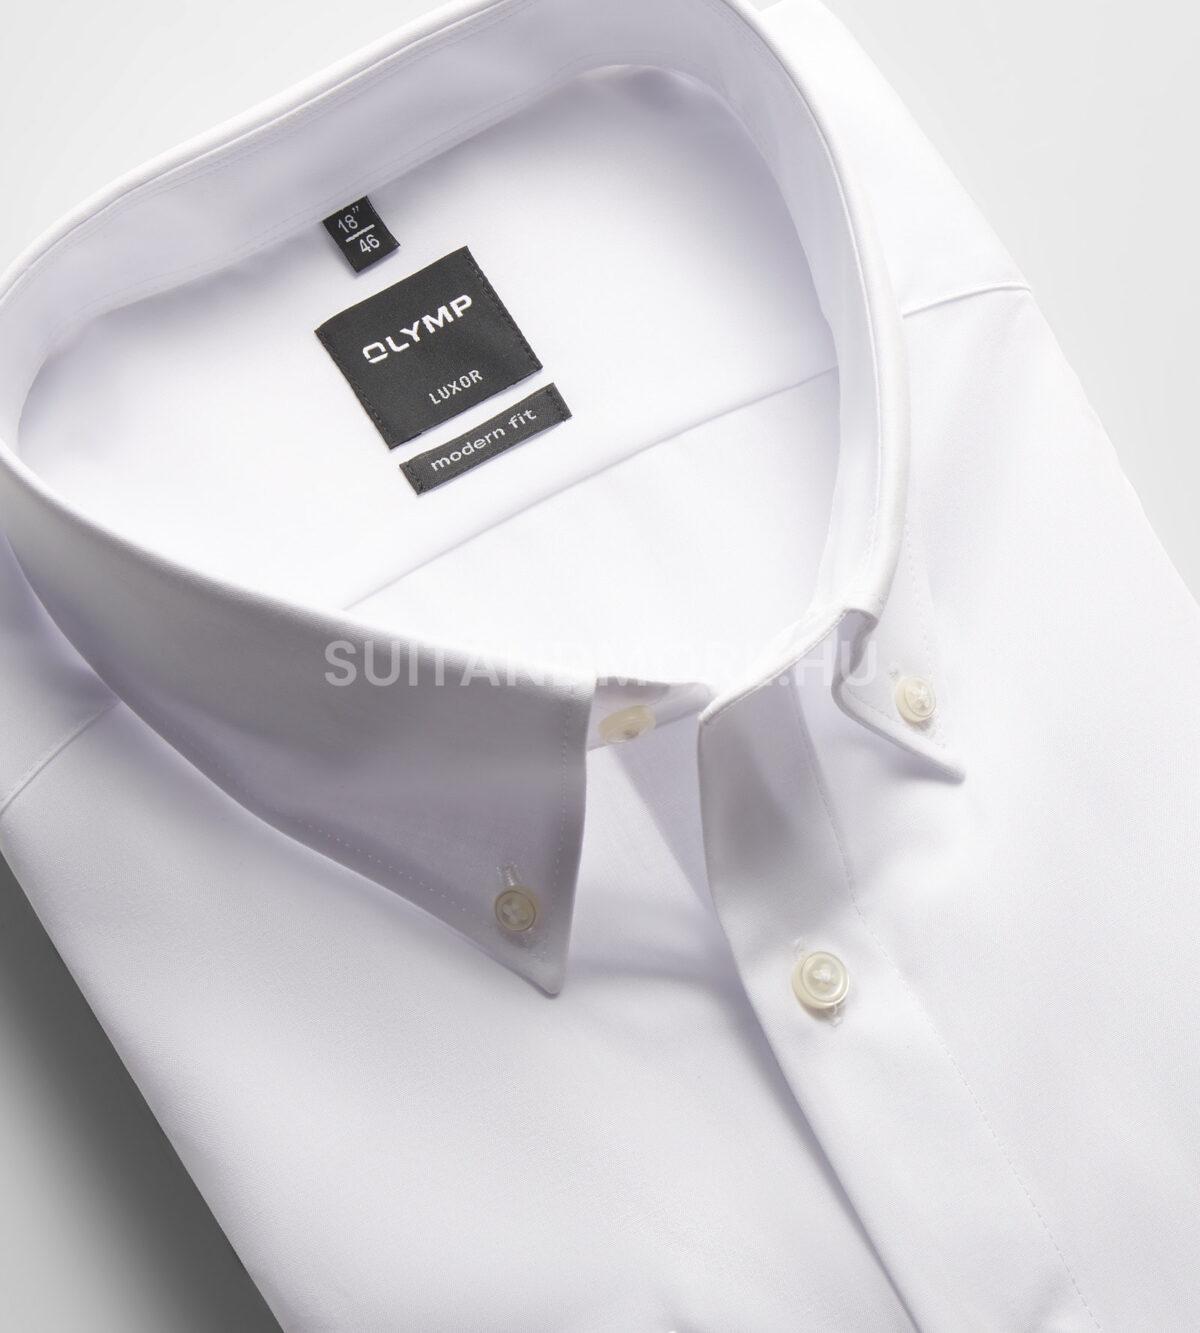 olymp-luxor-feher-modern-fit-vasalasmentes-ing-0303-64-00-02